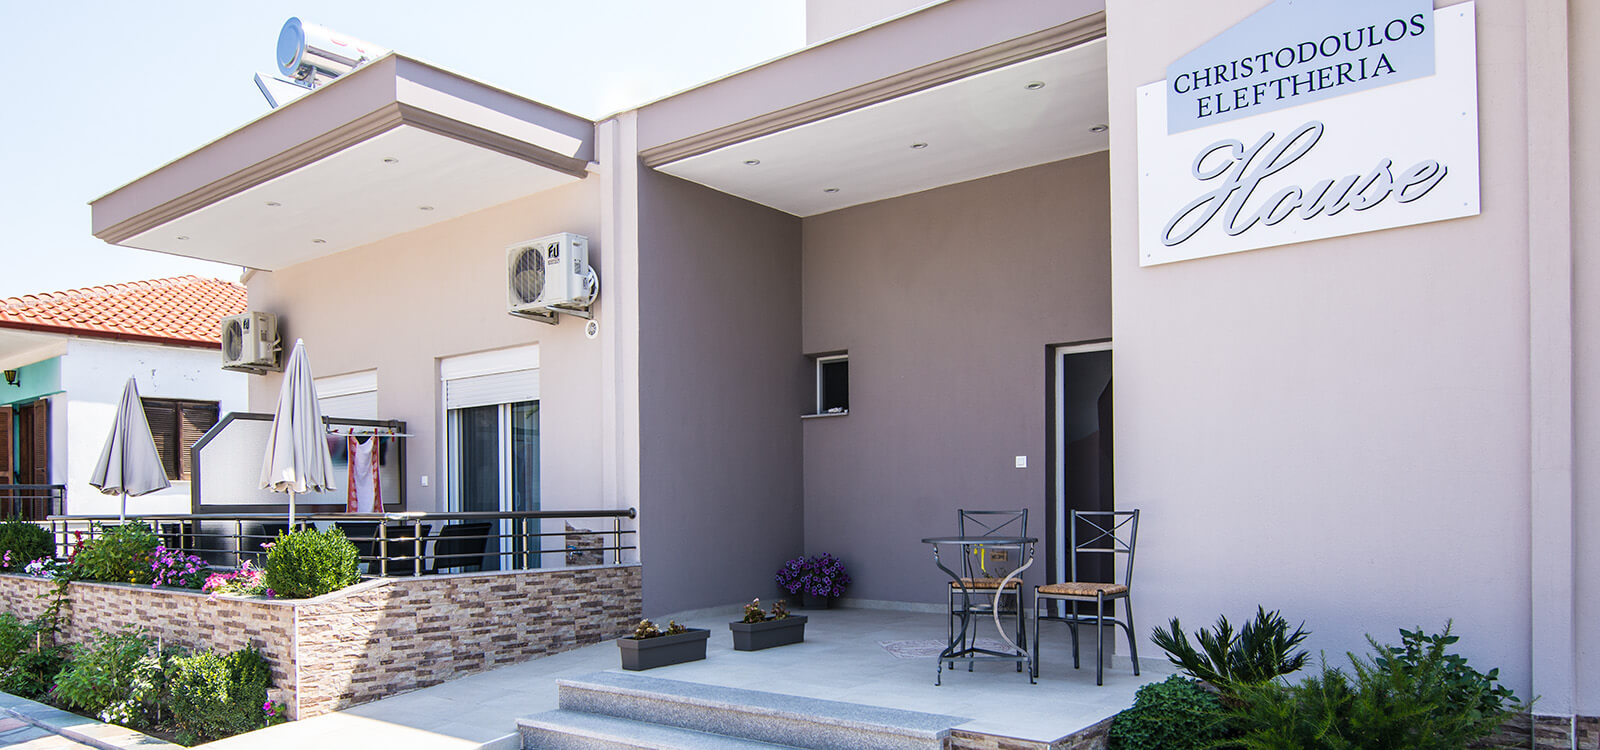 Christodoulos Eleftheria House Nea Vrasna Rent Rooms Apartments